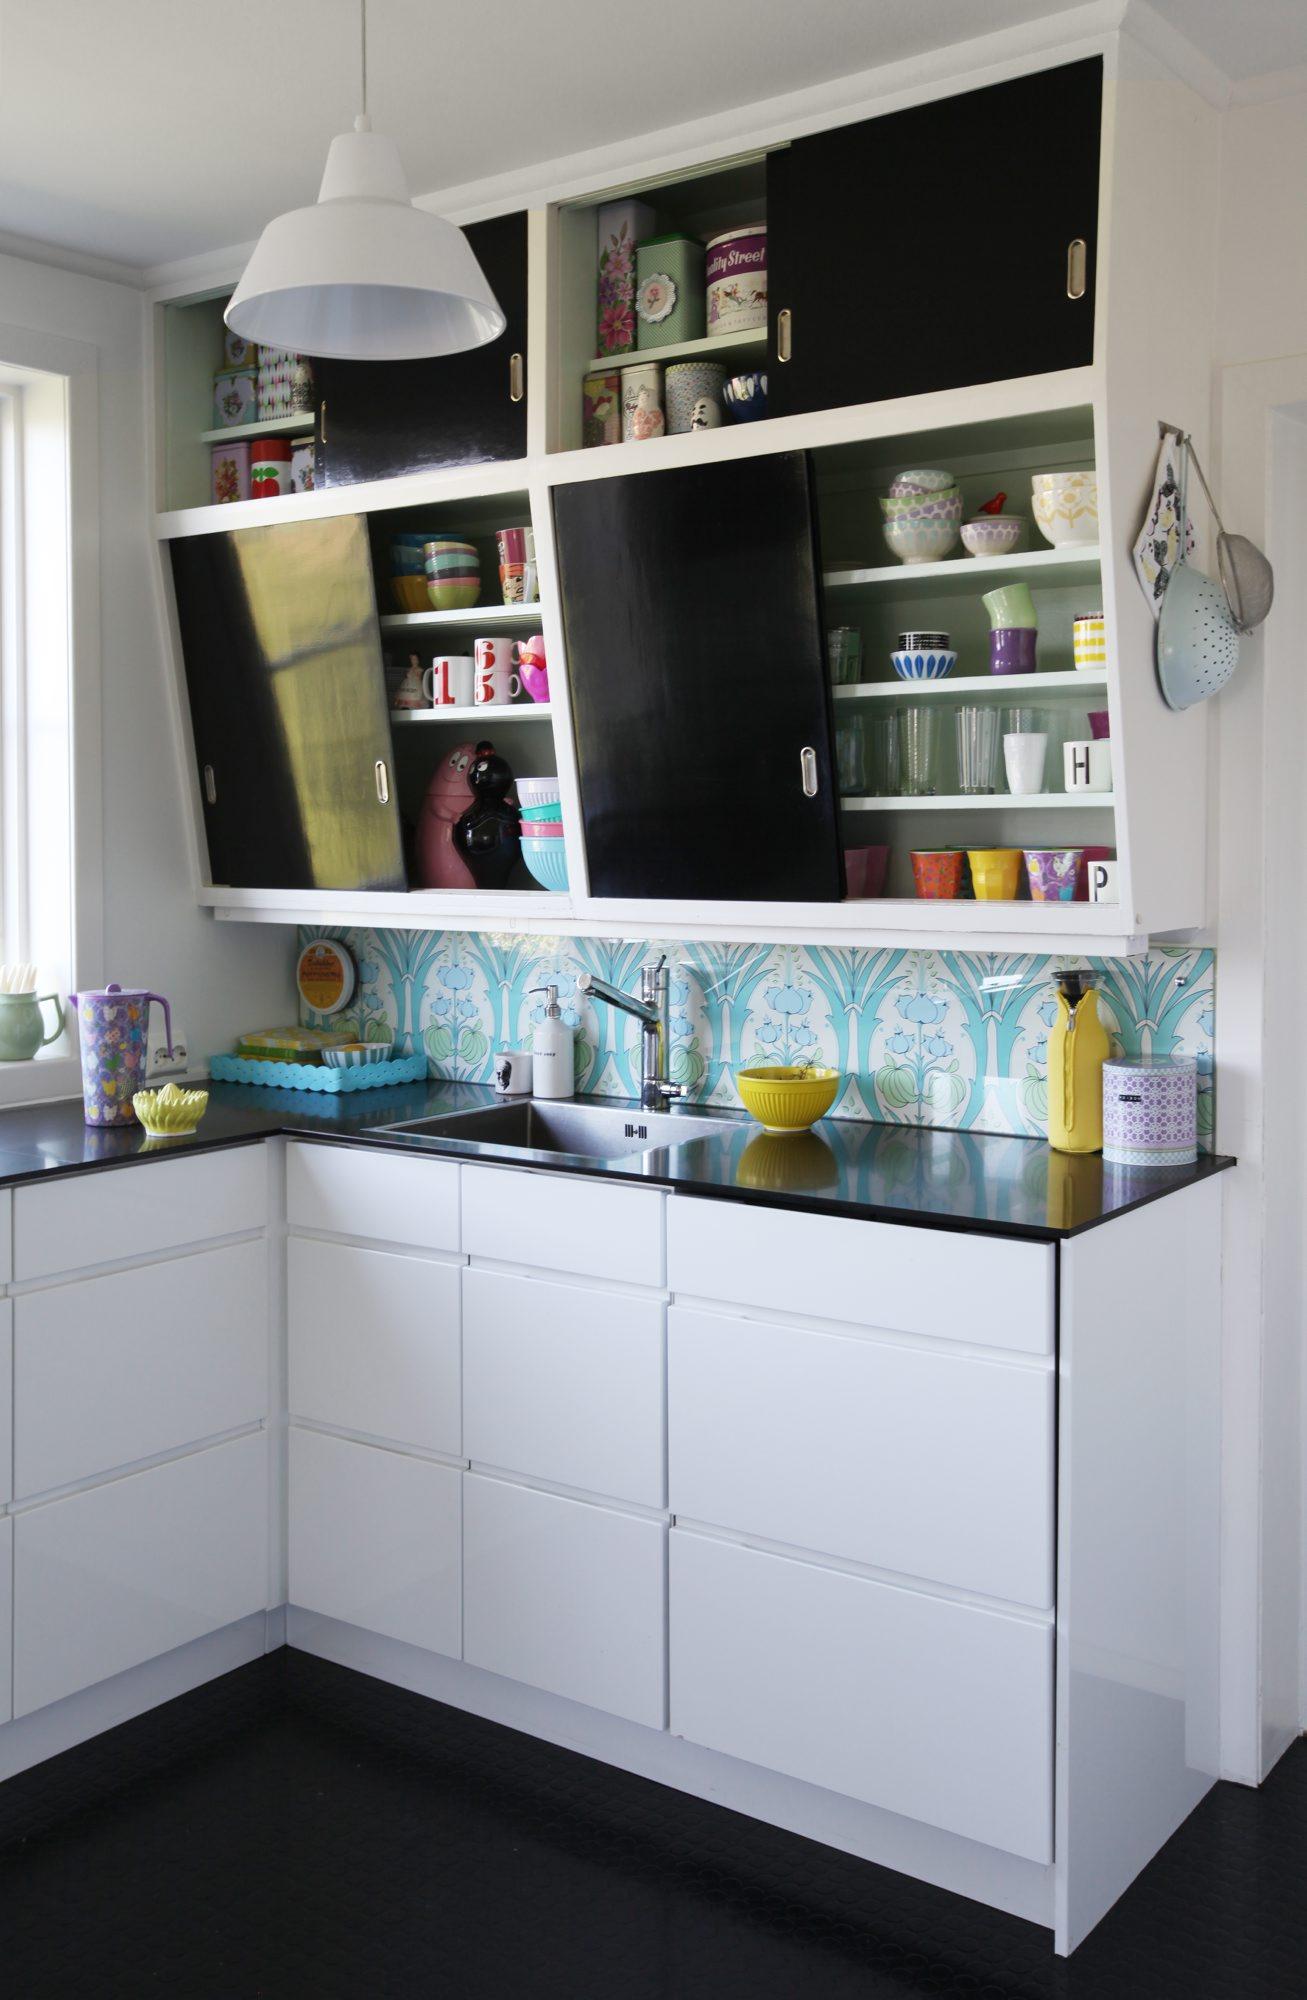 Bygge Kjkken. Finest Ikea Kitchen Wall Unit With Marble Top With Bygge Kjkken. Affordable Kunden ...